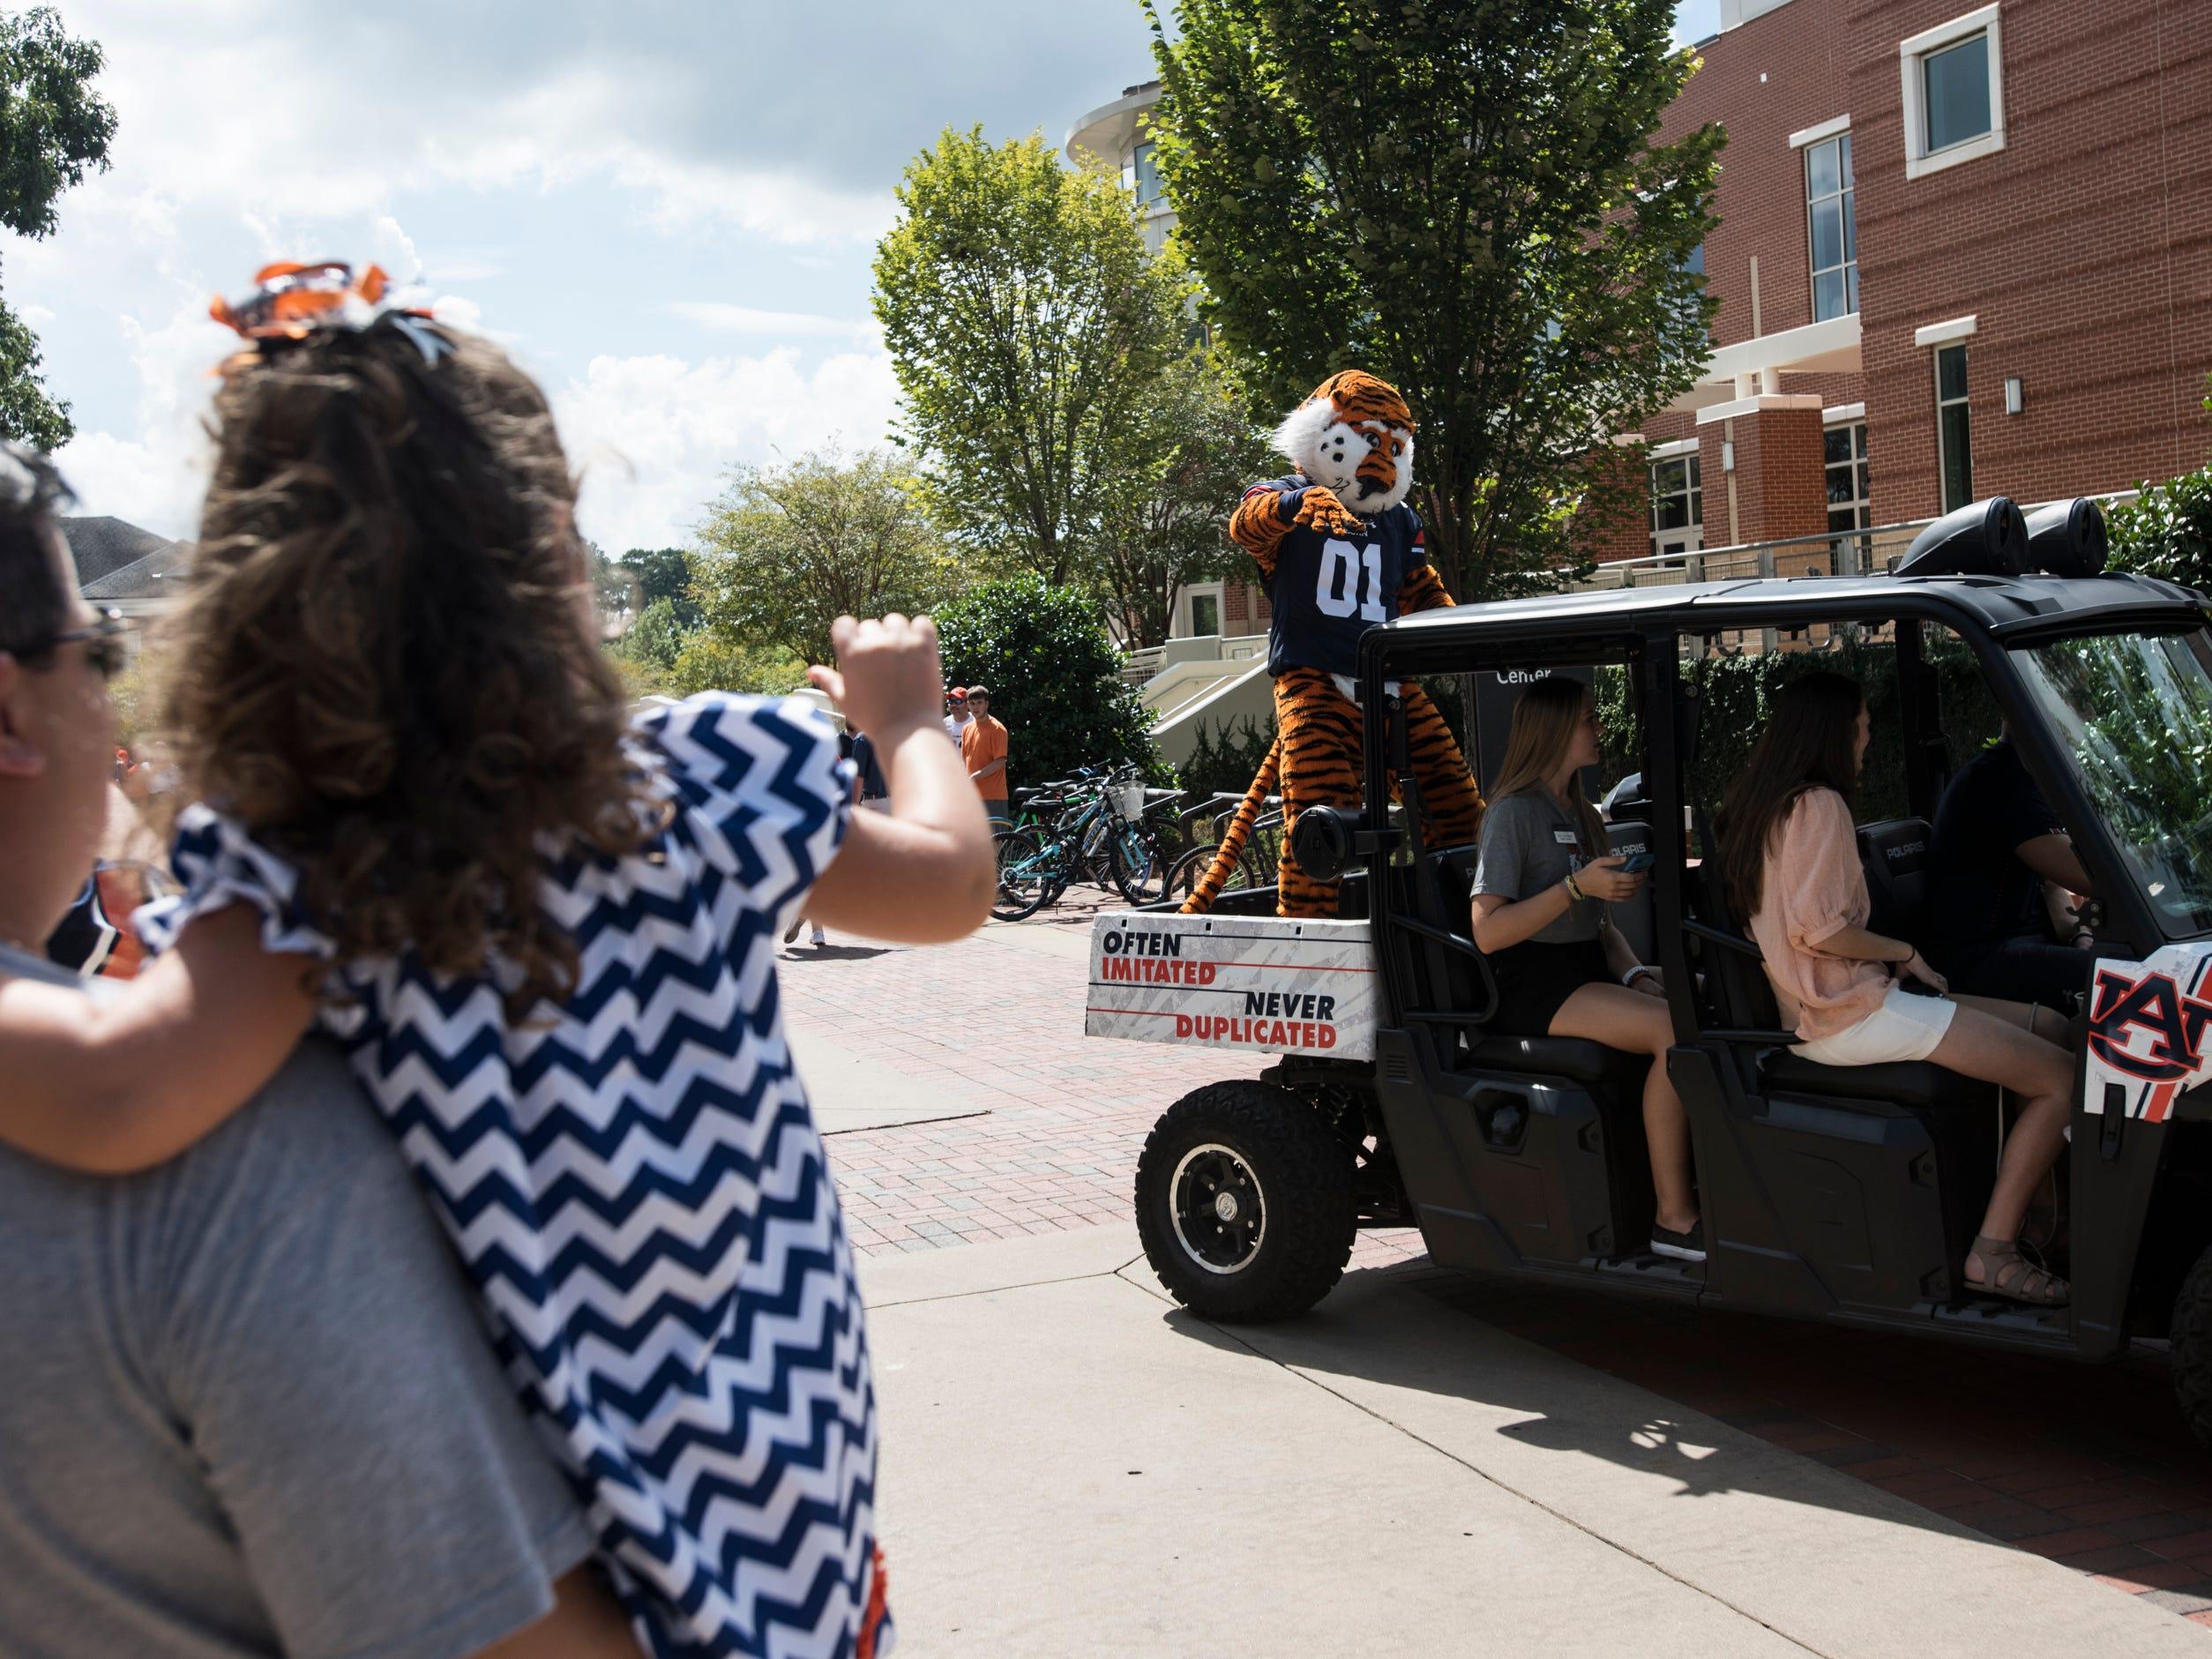 Fans wave at Auburn mascot, Aubie, as he drives around campus outside Jordan-Hare Stadium in Auburn, Ala., on Saturday, Sept. 29, 2018.